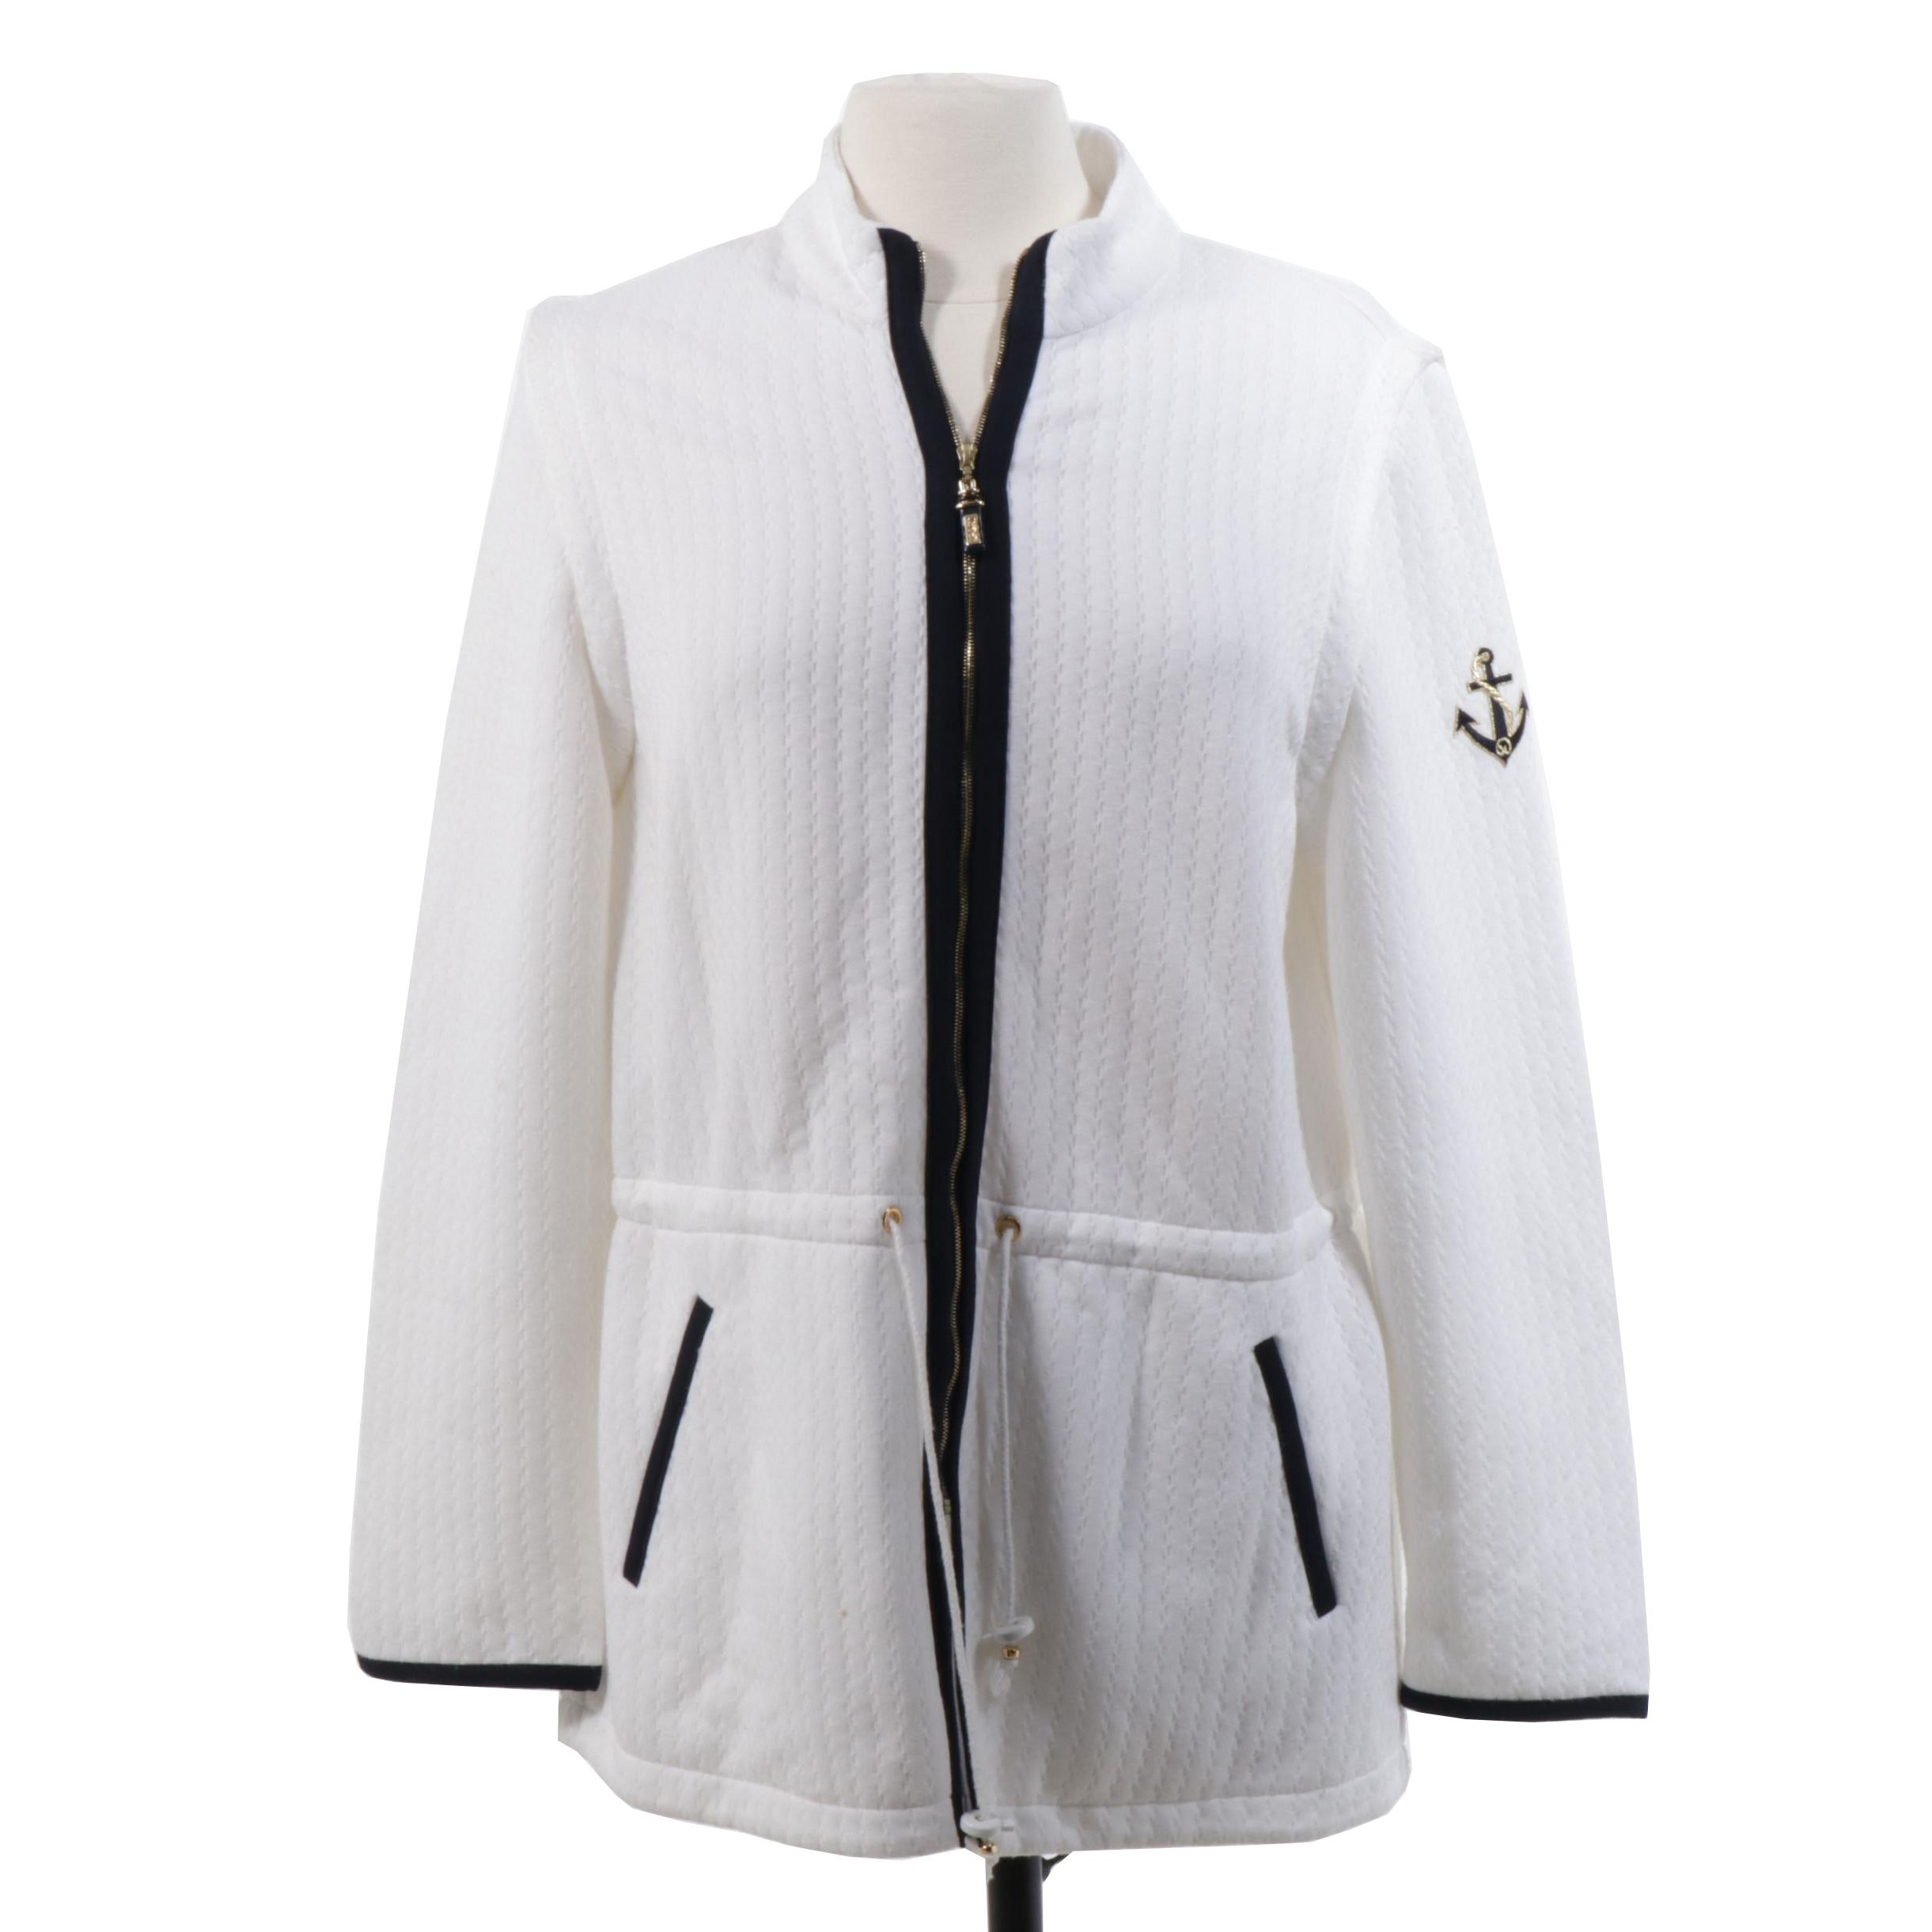 St. John Sport Convertible Jacket